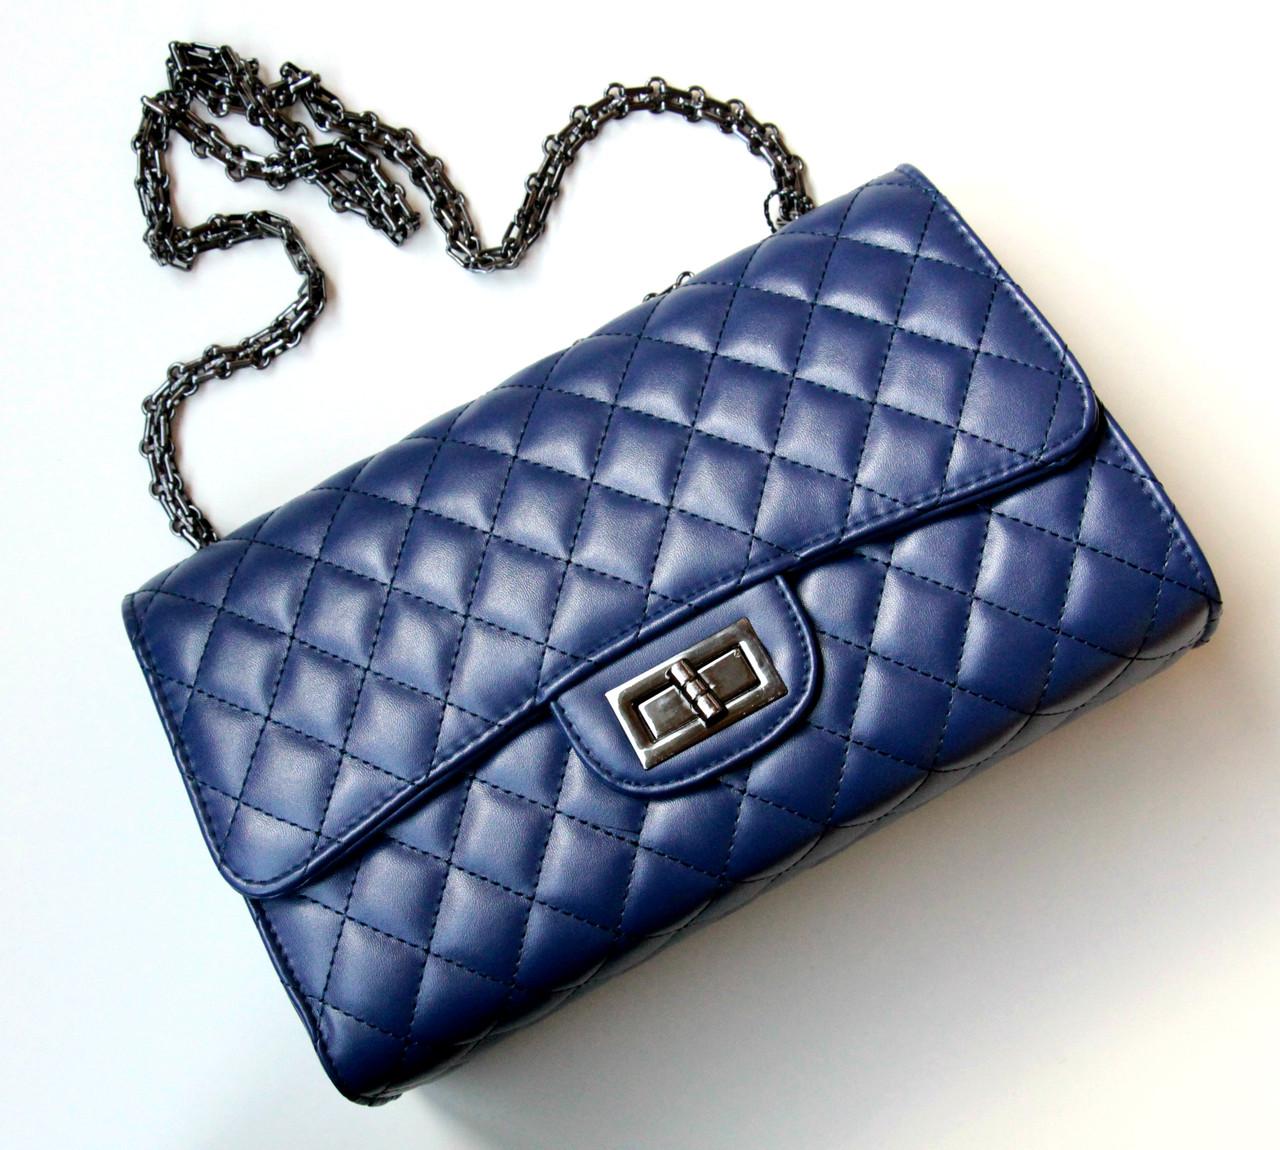 7eb6cf1af6cb Женская сумка в стиле Chanel Flap синяя, сумки женские 2015 -  Интернет-магазин